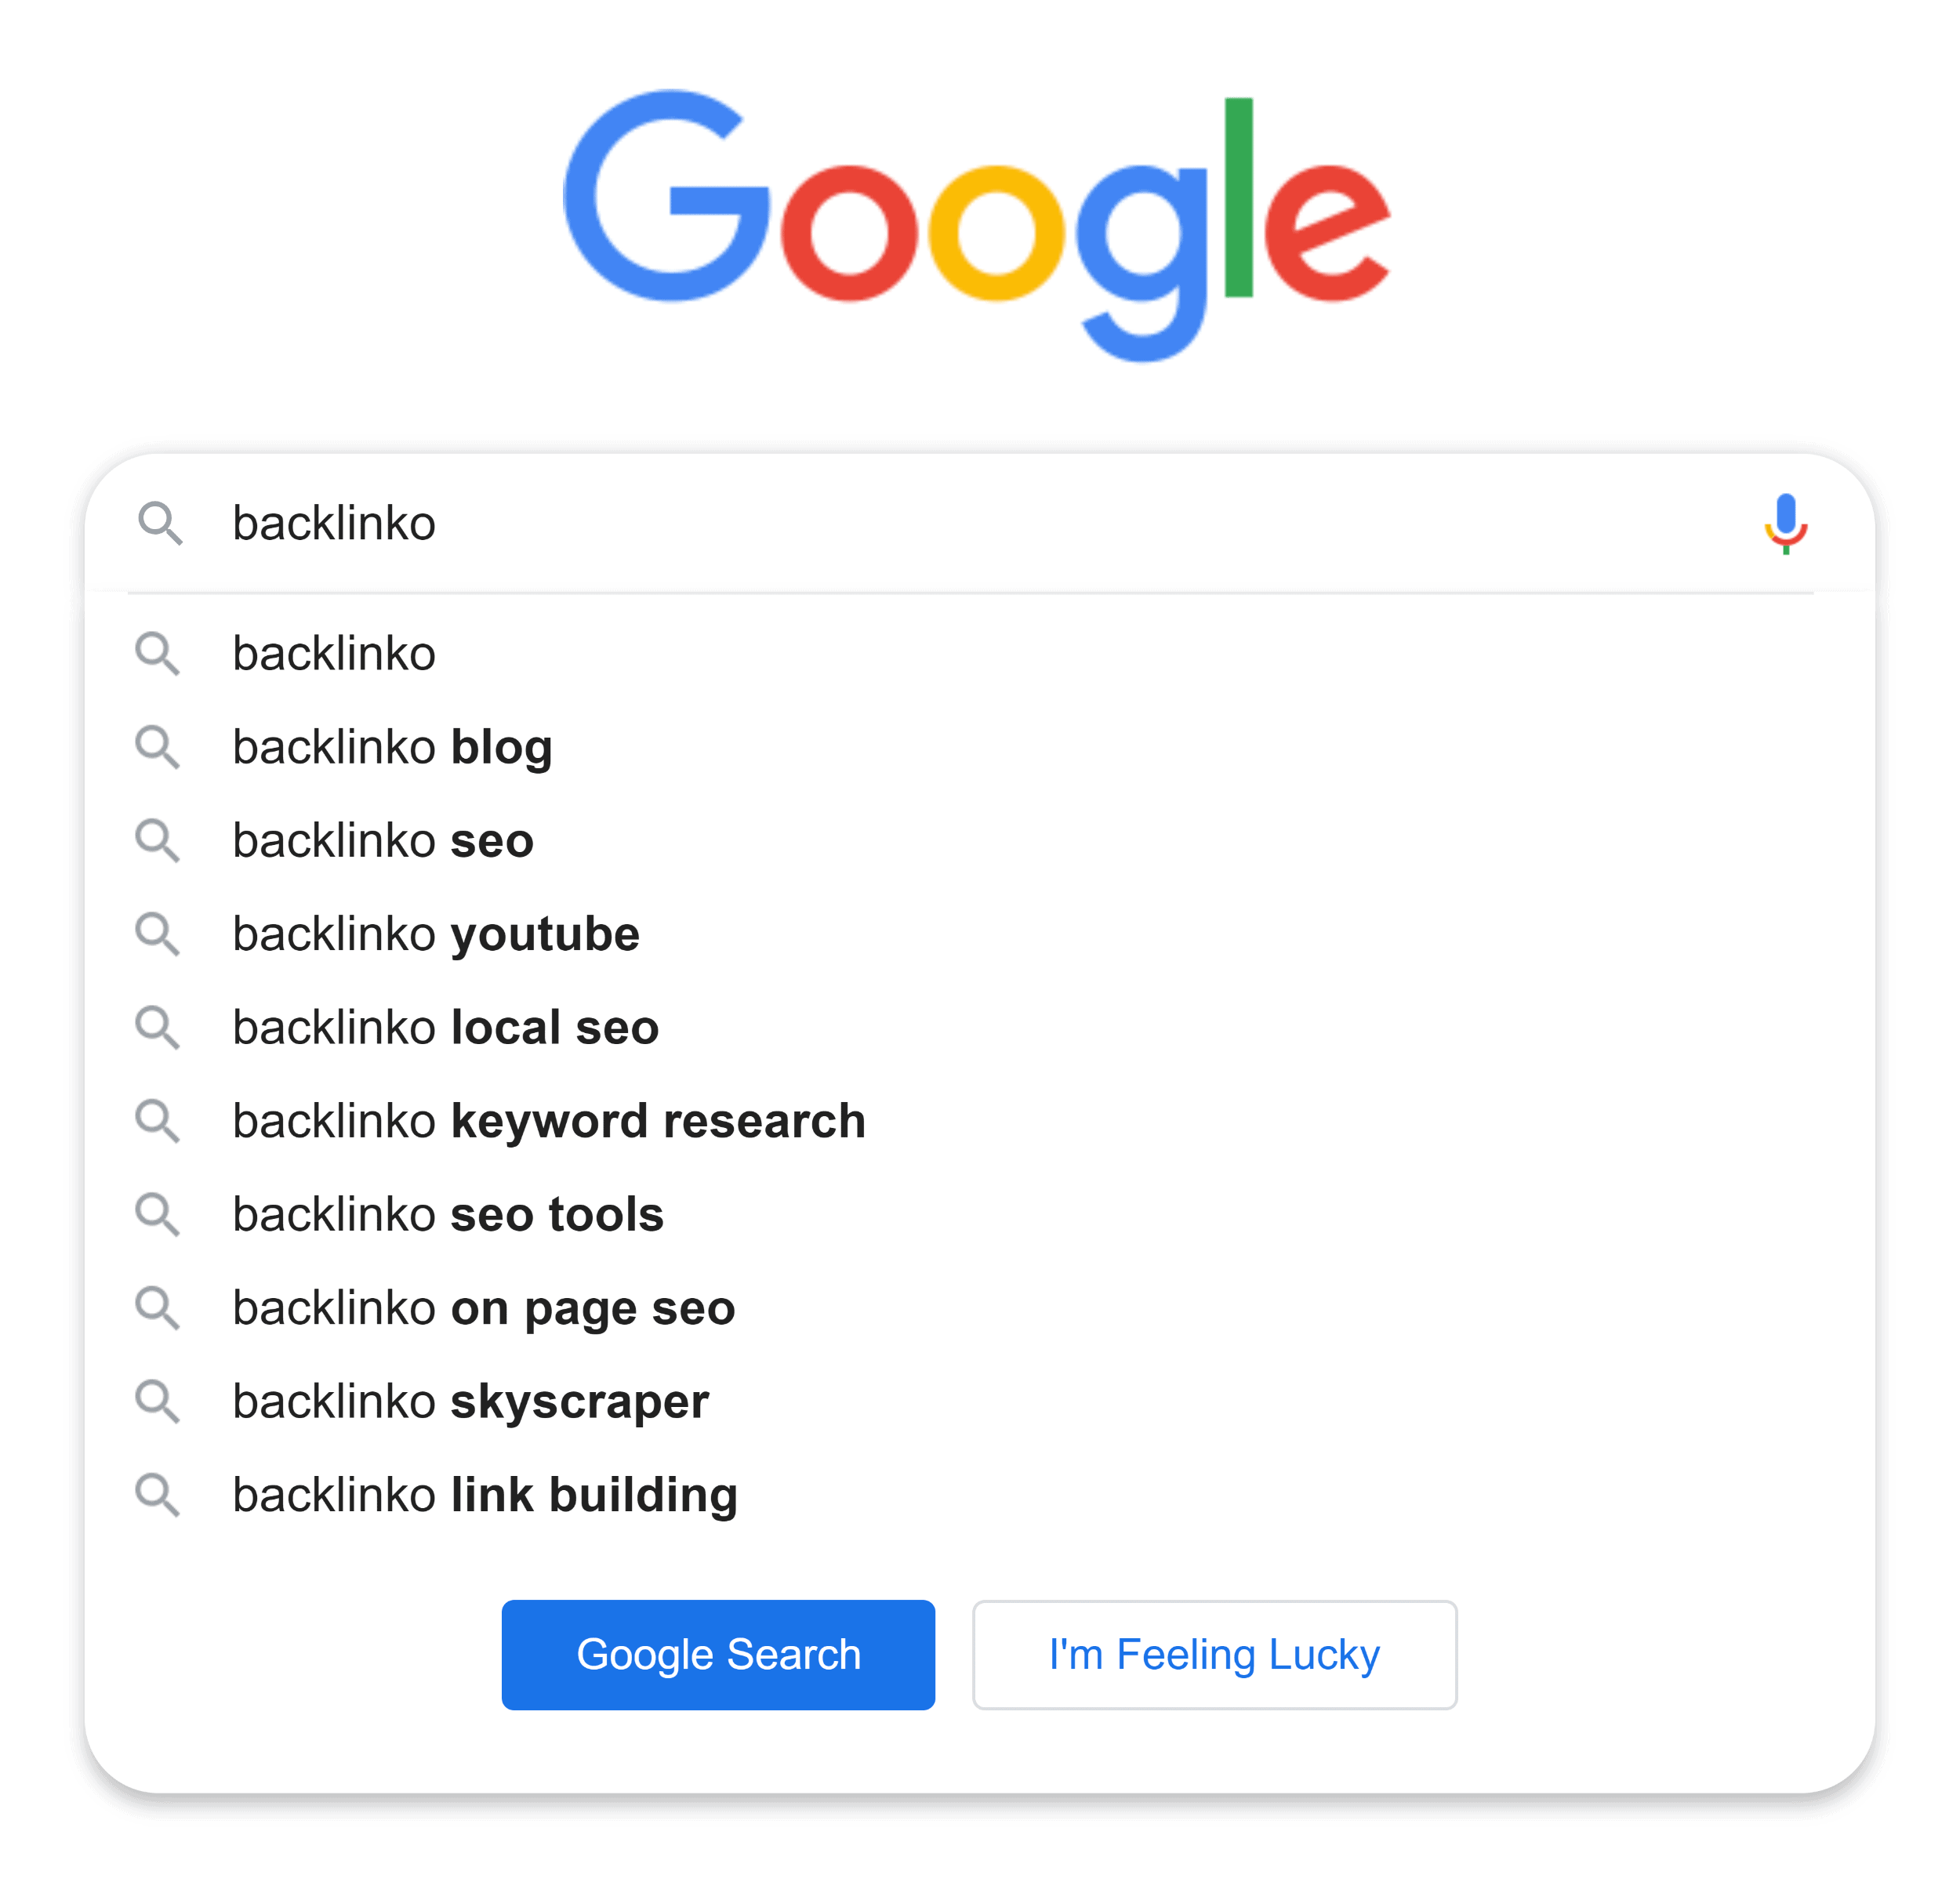 Google suggest – Backlinko